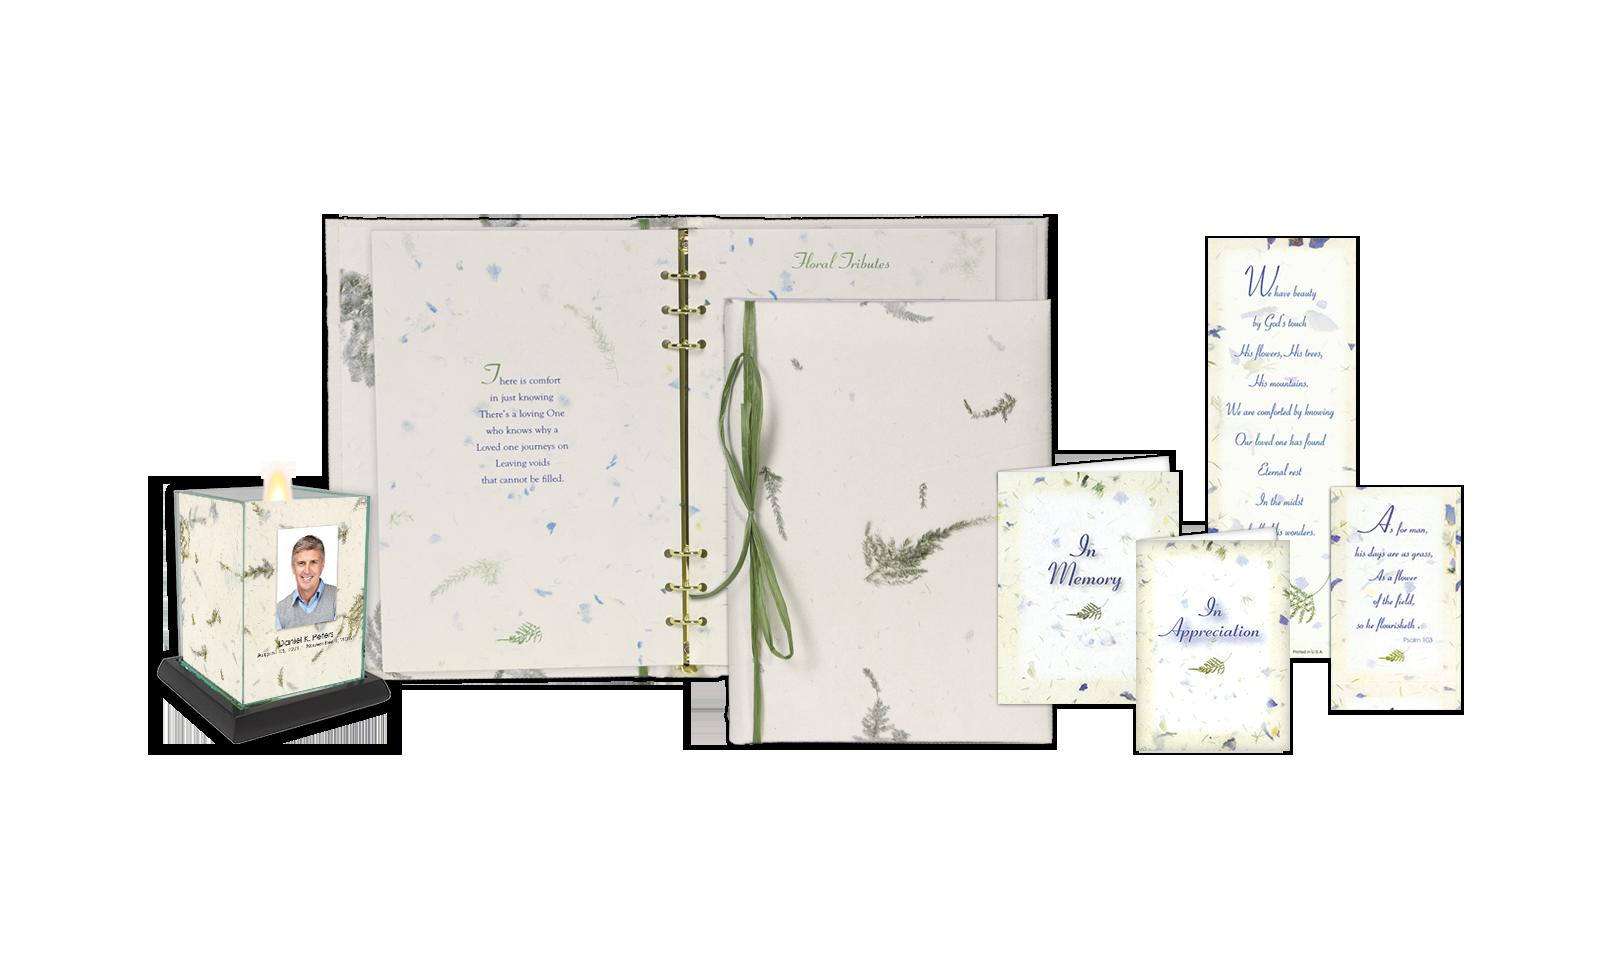 ROL Handmade Fern Paper Series 248 HM